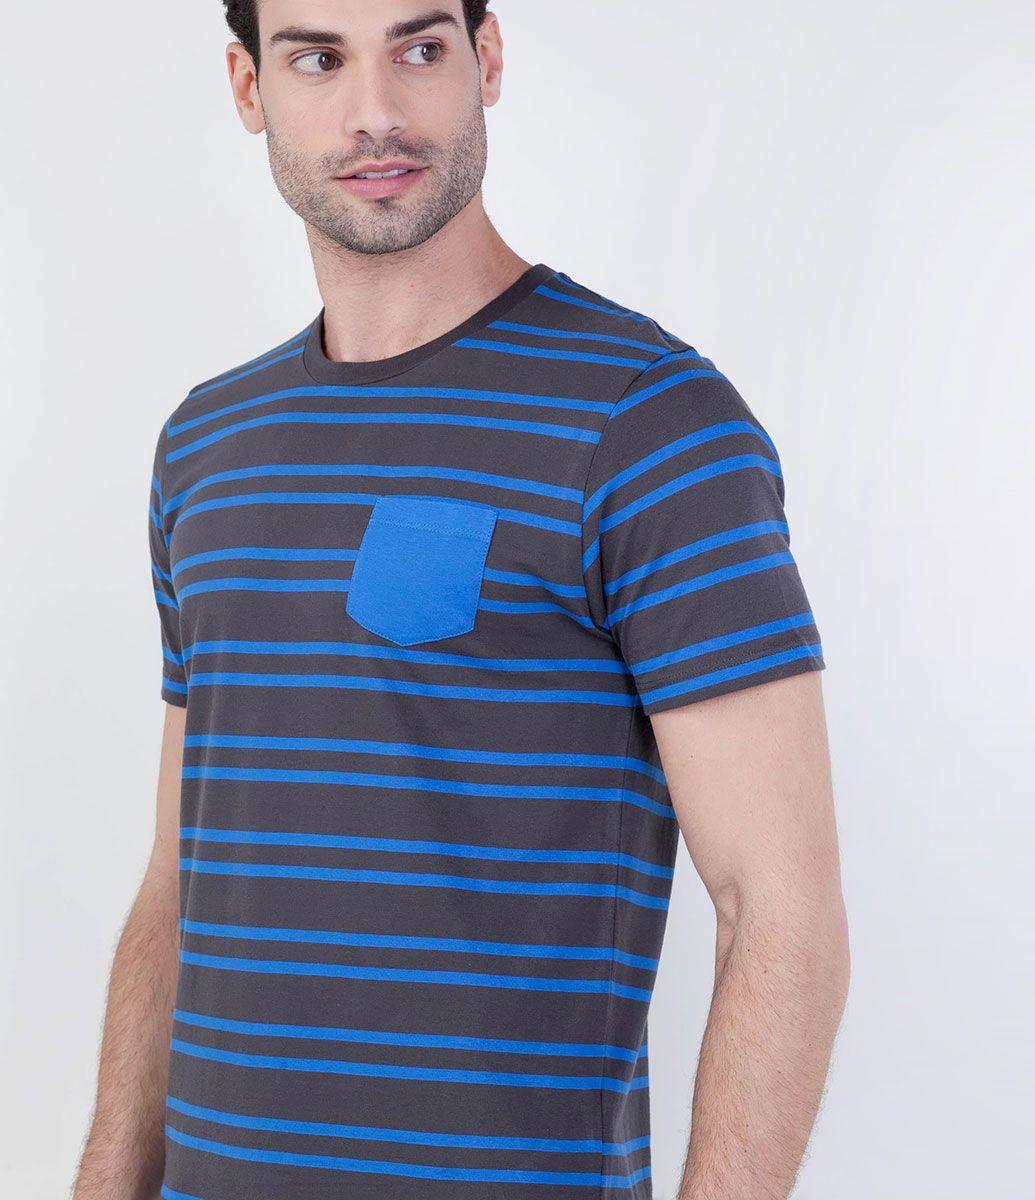 13d043de44 Camiseta Masculina Listrada - Lojas Renner